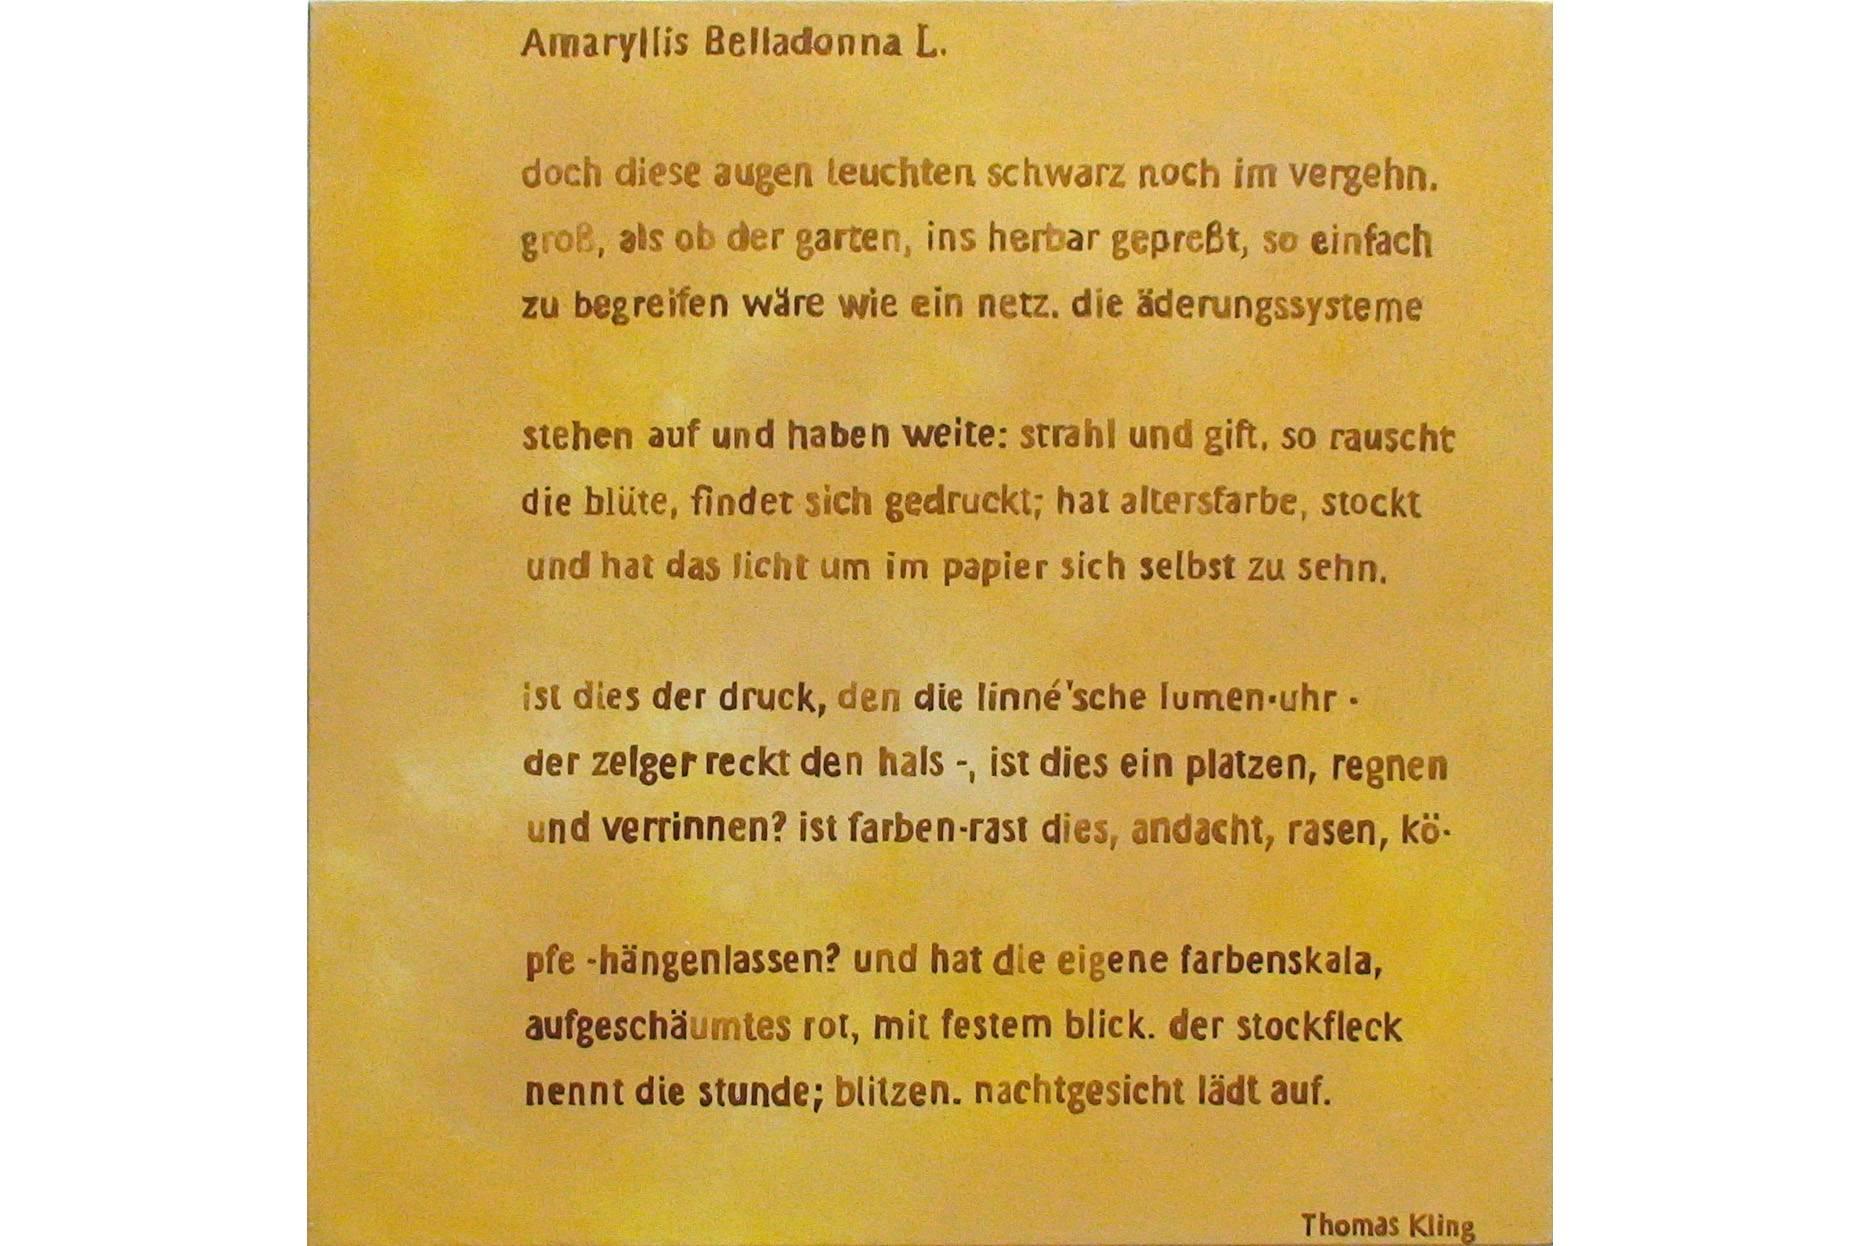 Schriftbild Amaryllis 2006 Acrylfarbe a/Nessel 90 x 90 cm (Copyright)Text Thomas Kling Suhrkamp Verlag Berlin 2020